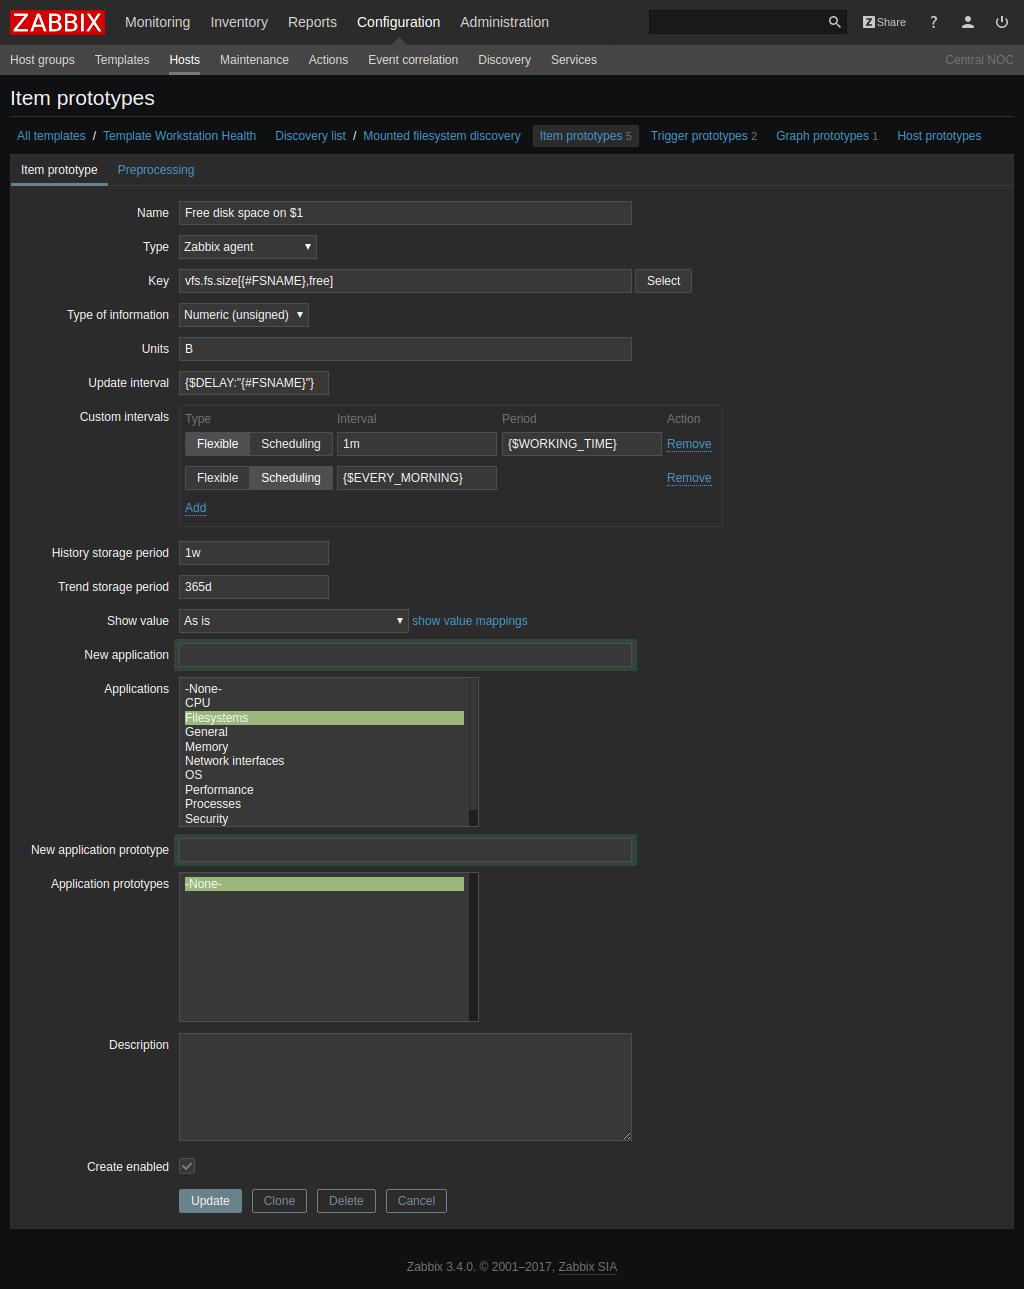 Whats New in Zabbix 3.4